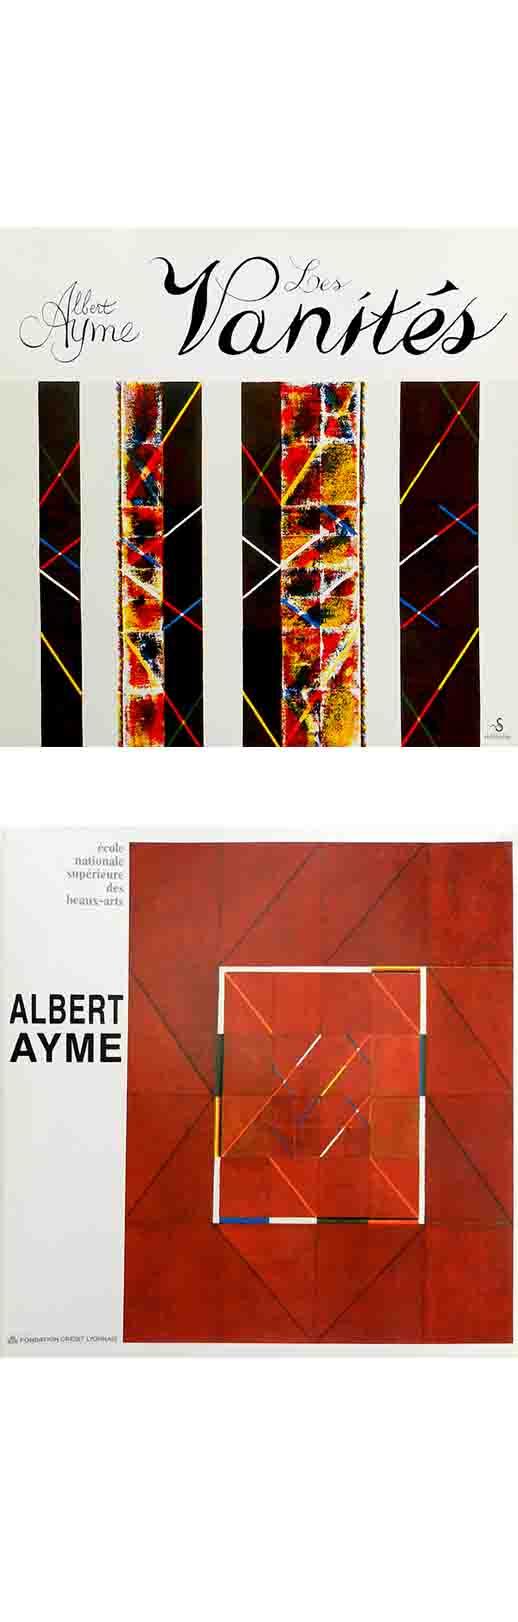 ALBERT AYME - LES VANITÉS